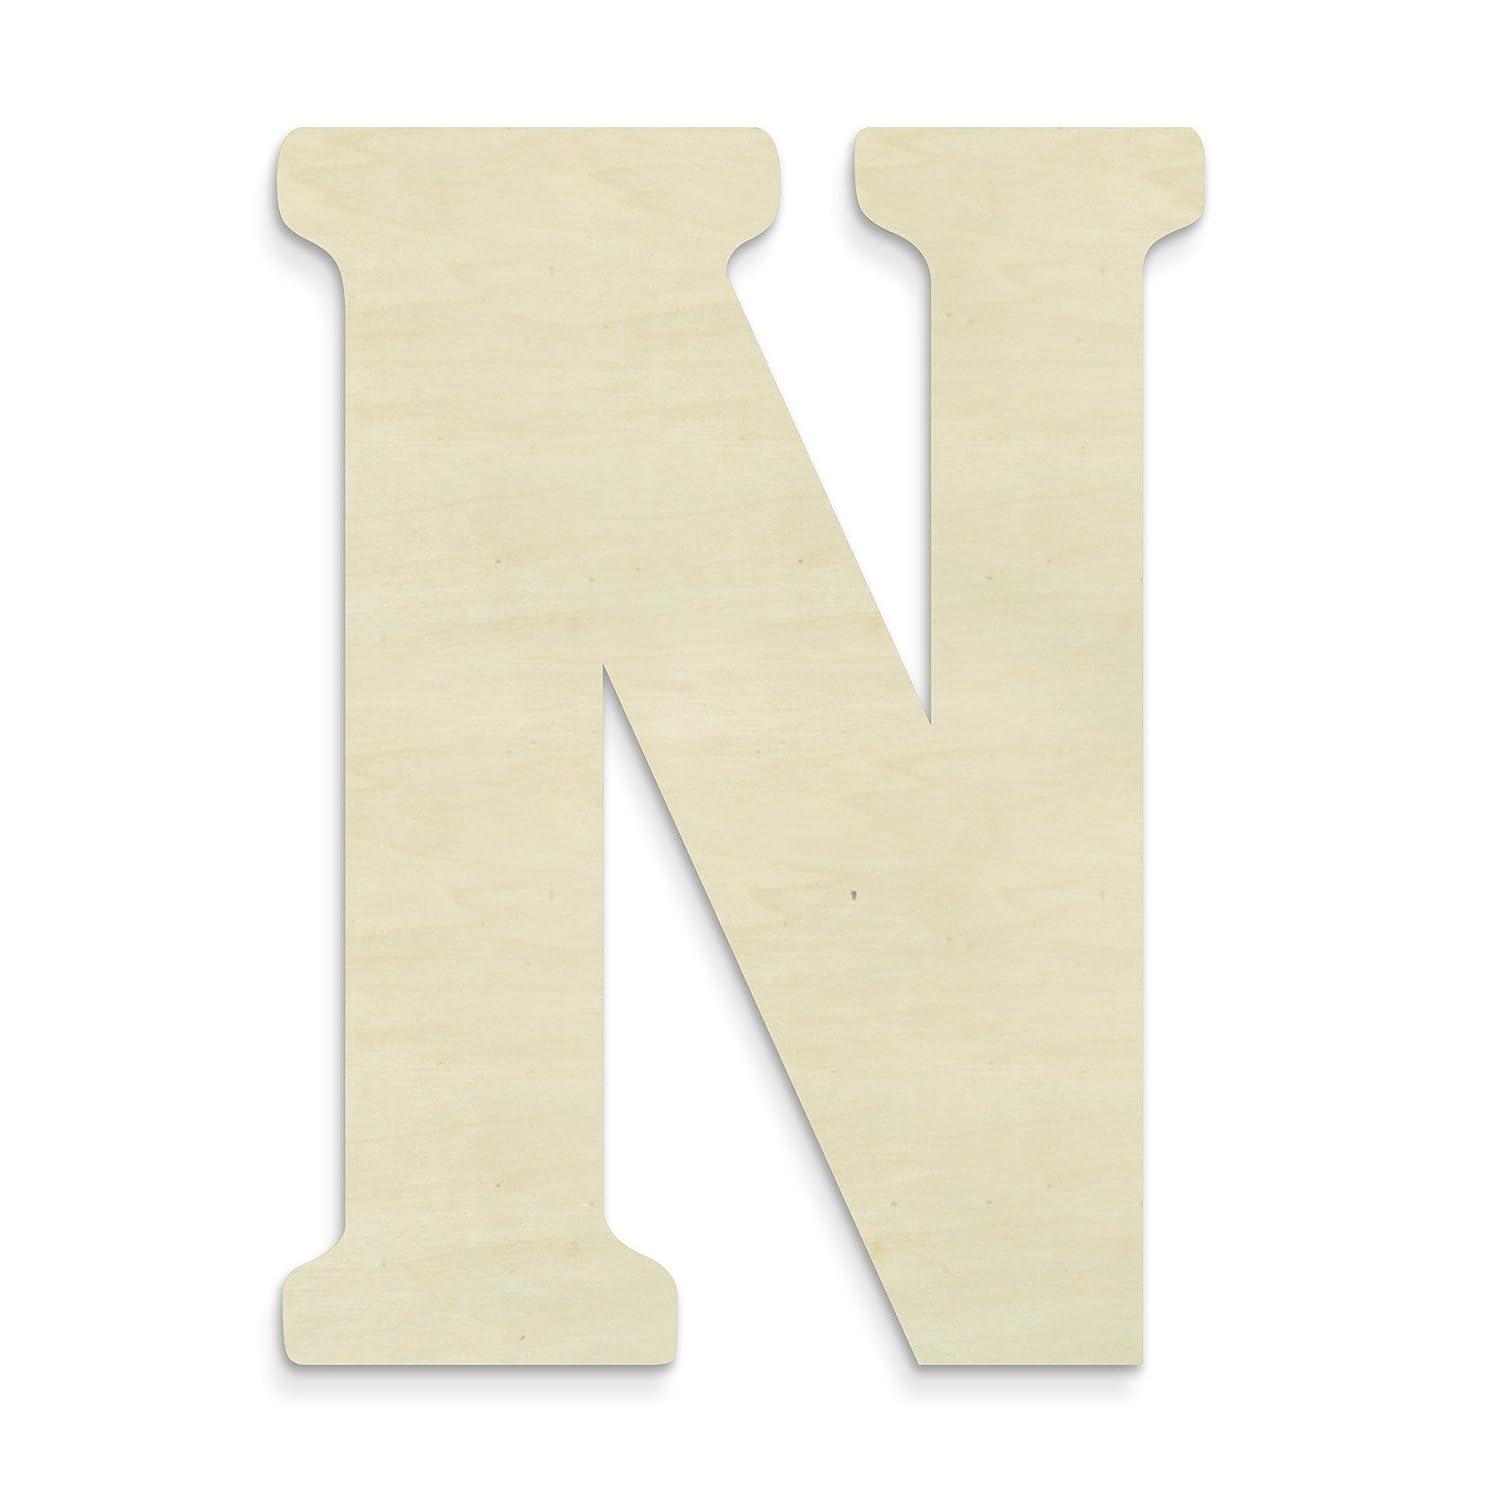 UNFINISHEDWOODCO Unfinished Wood Letter, 15-Inch, Monogrammed N, Large